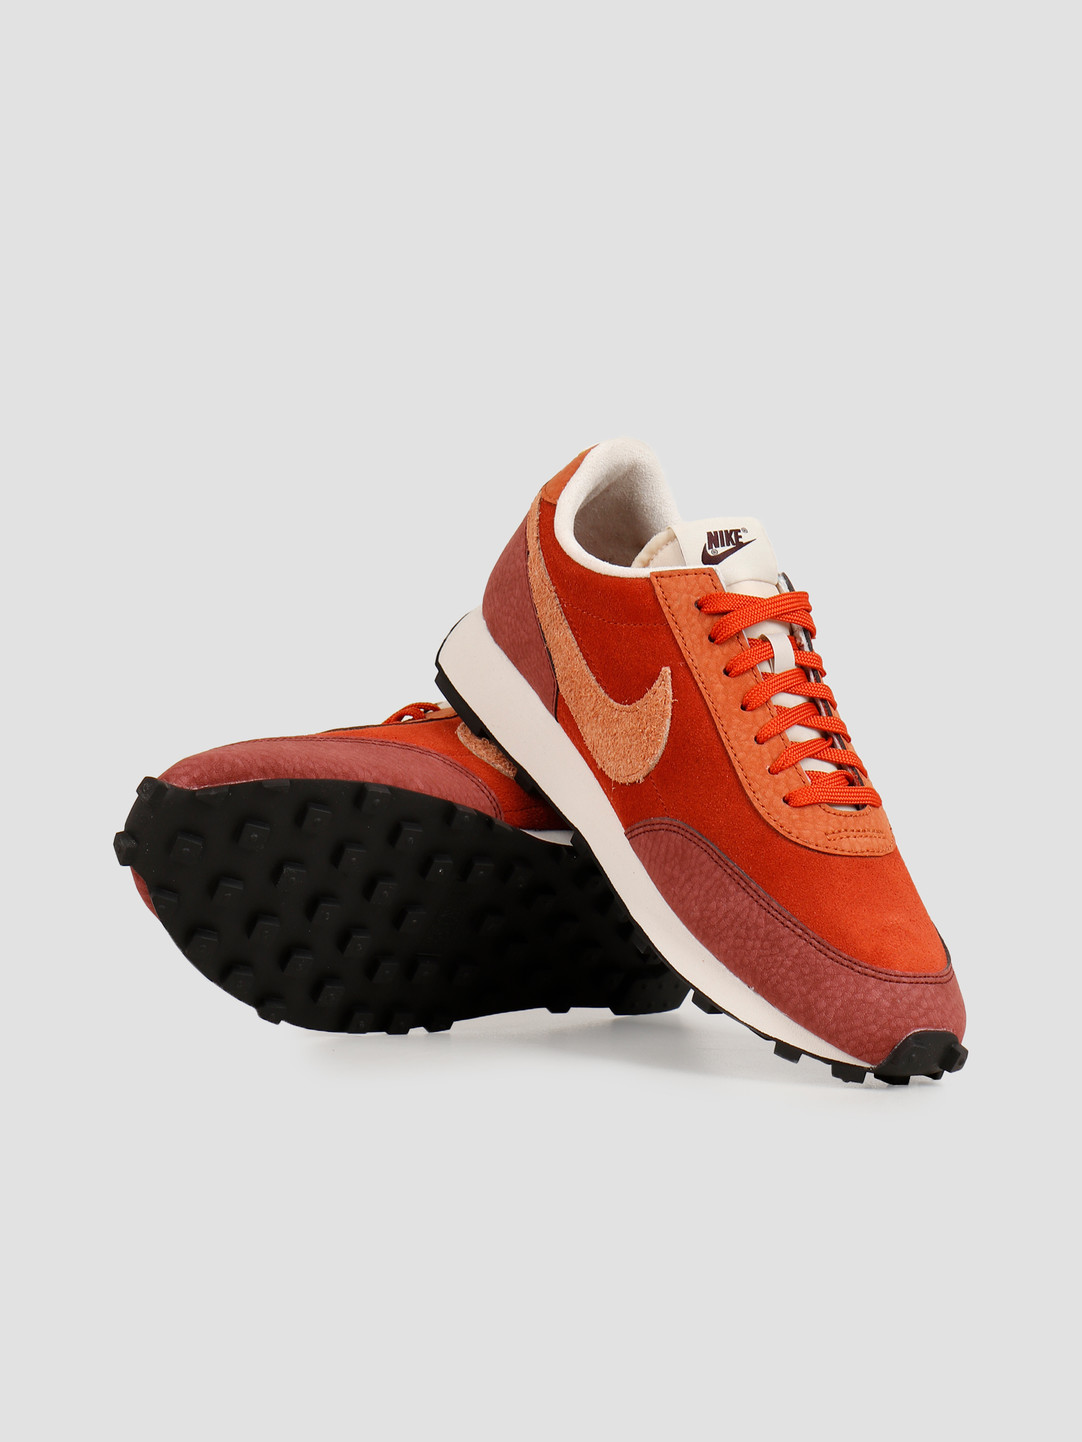 Nike Nike Daybreak Rugged Orange Desert Orange Pueblo Brown CU3016-800